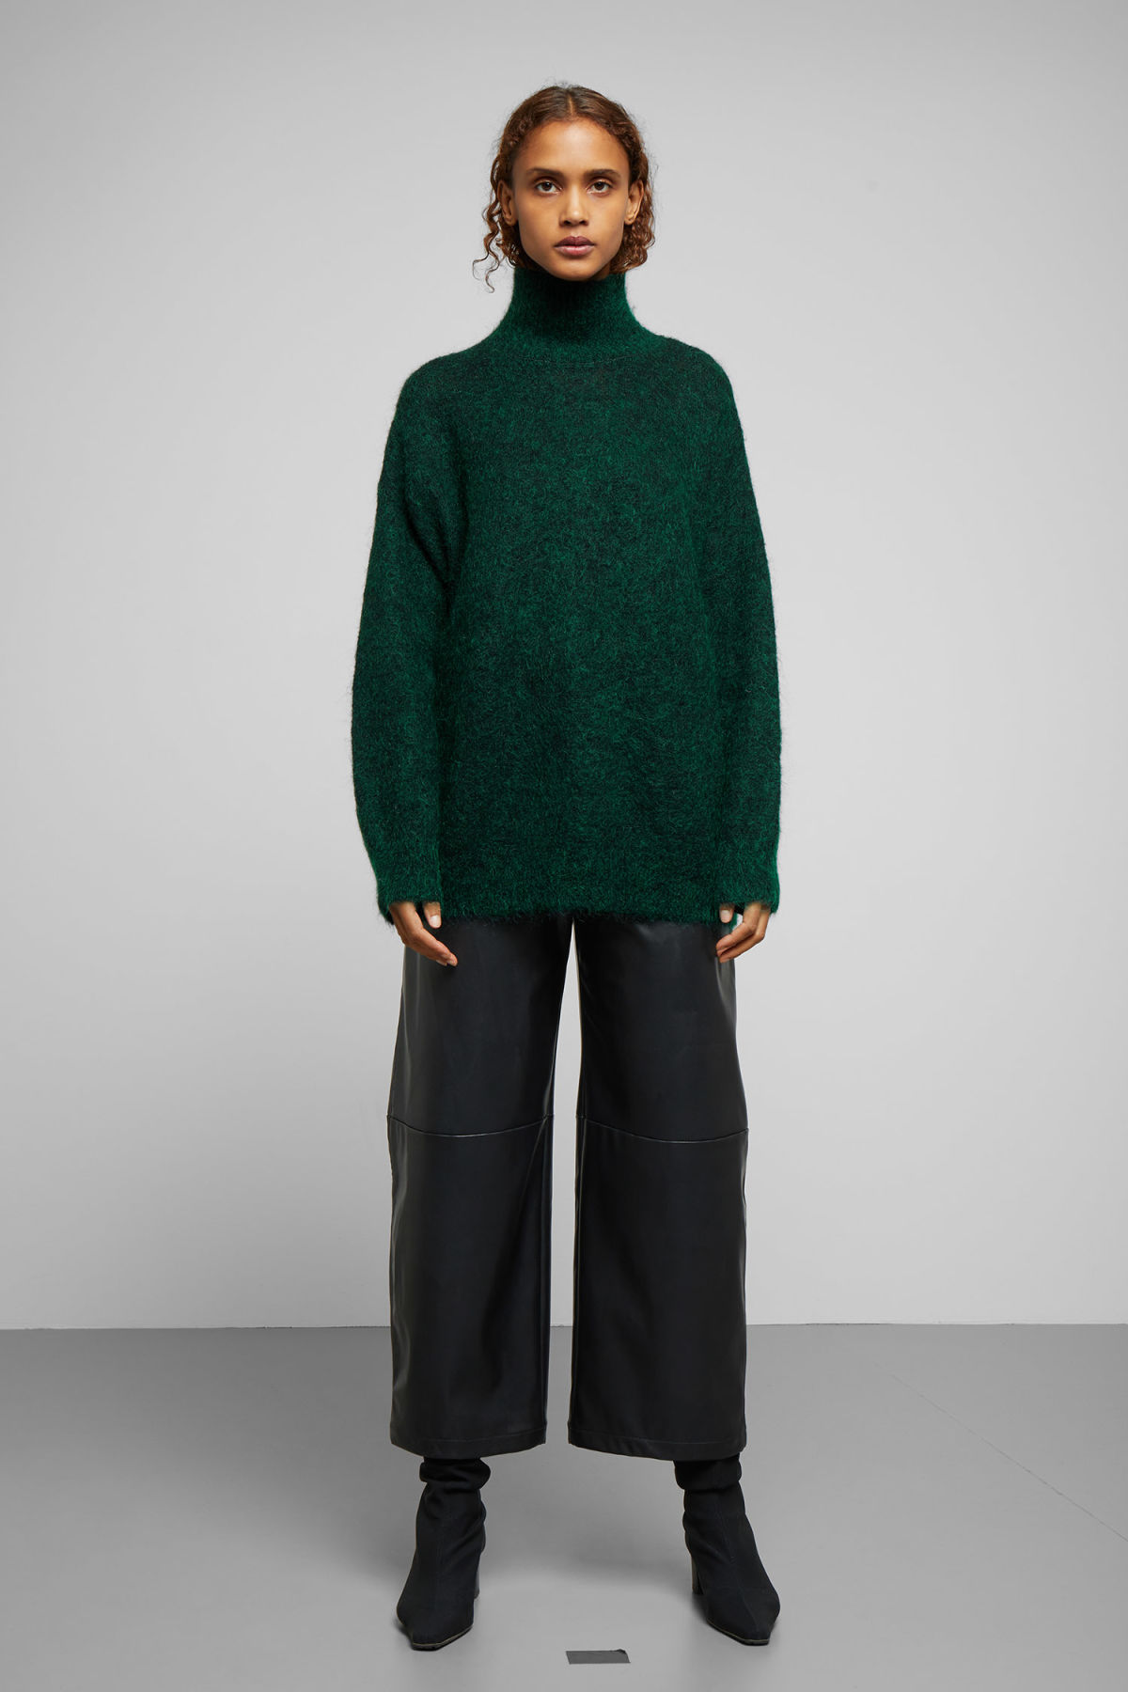 7e1771d45e107 Hailey Wool and Mohair Blend Turtleneck - Beige - Knitwear - Weekday